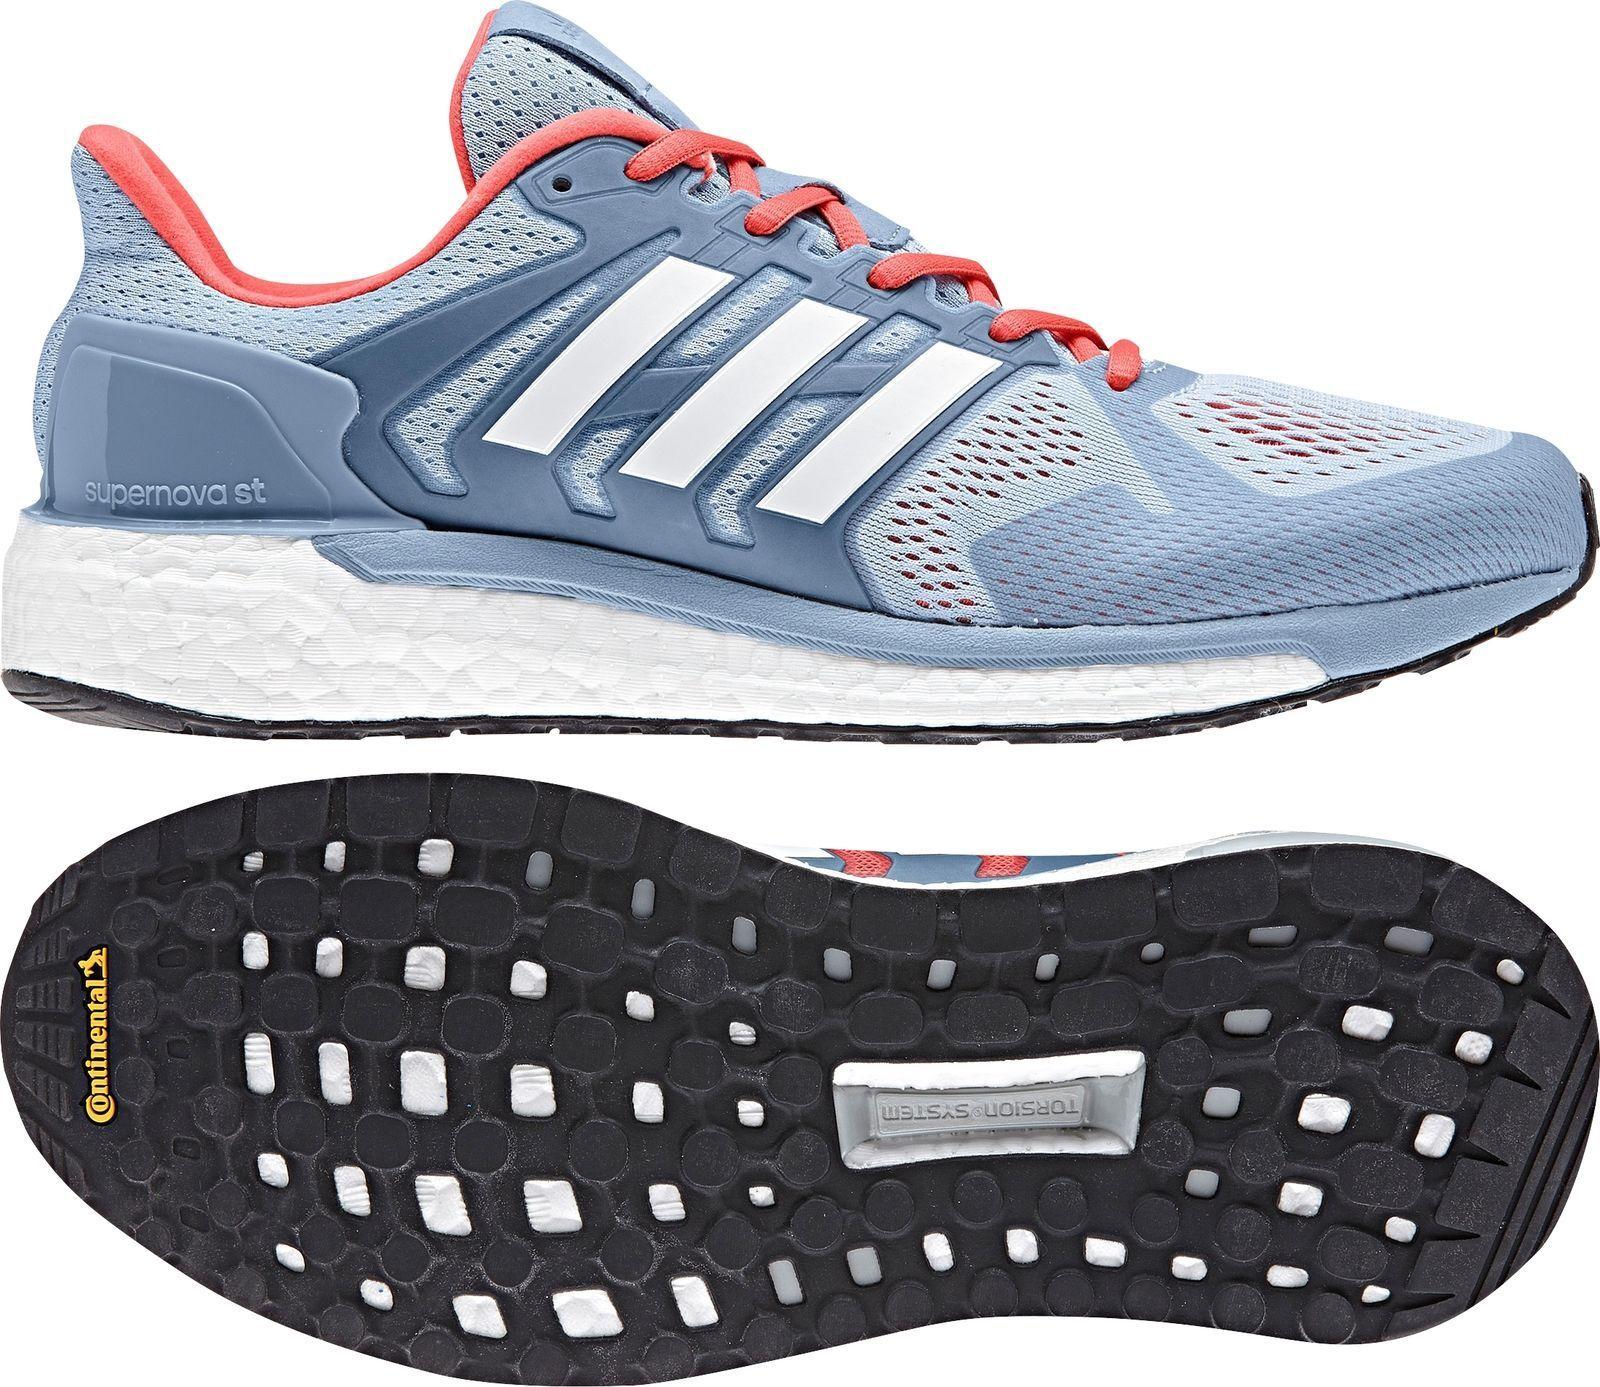 NiB~Adidas SUPERNOVA ST BOOST Running Pure energy Response Shoe Gym~Women sz 7.5